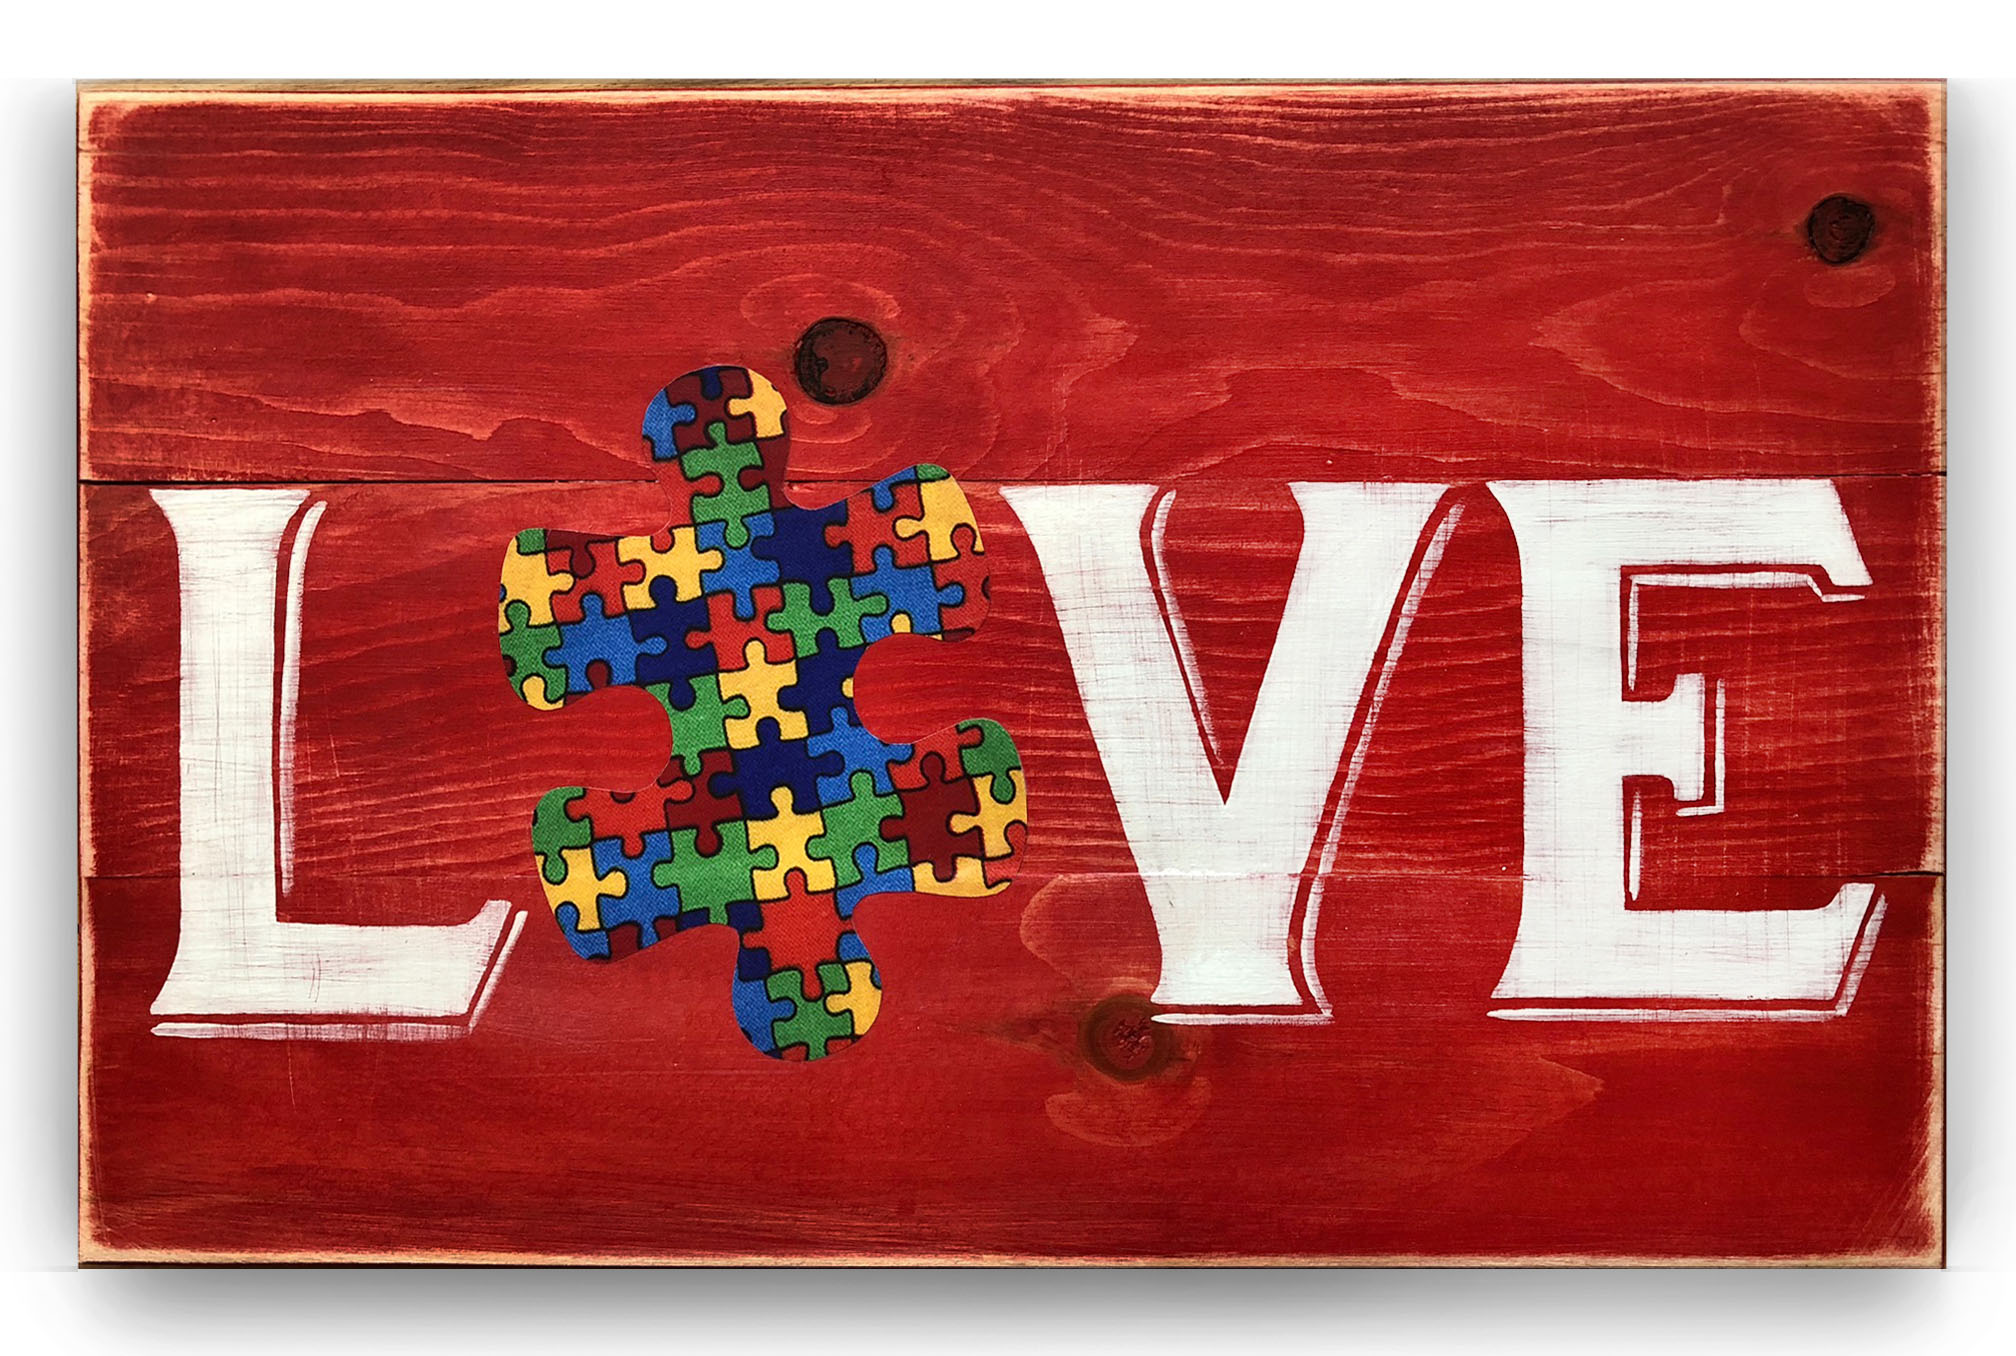 autismlove.jpg